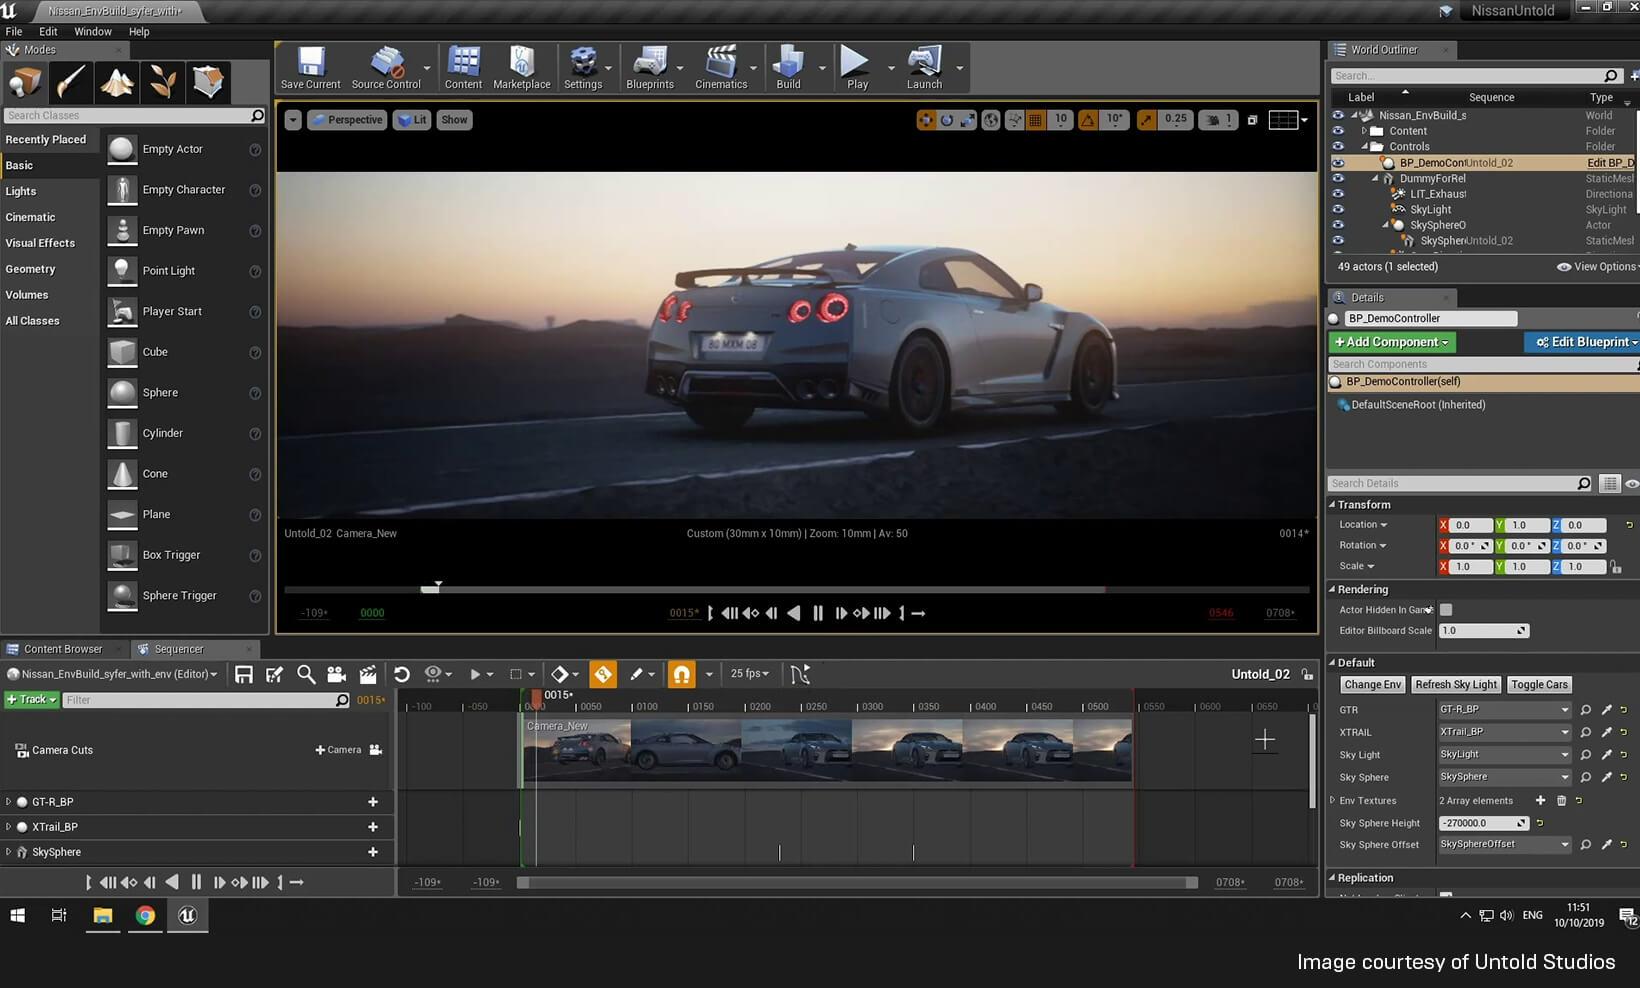 Spotlight_Nissan_blog_body_img2.jpg